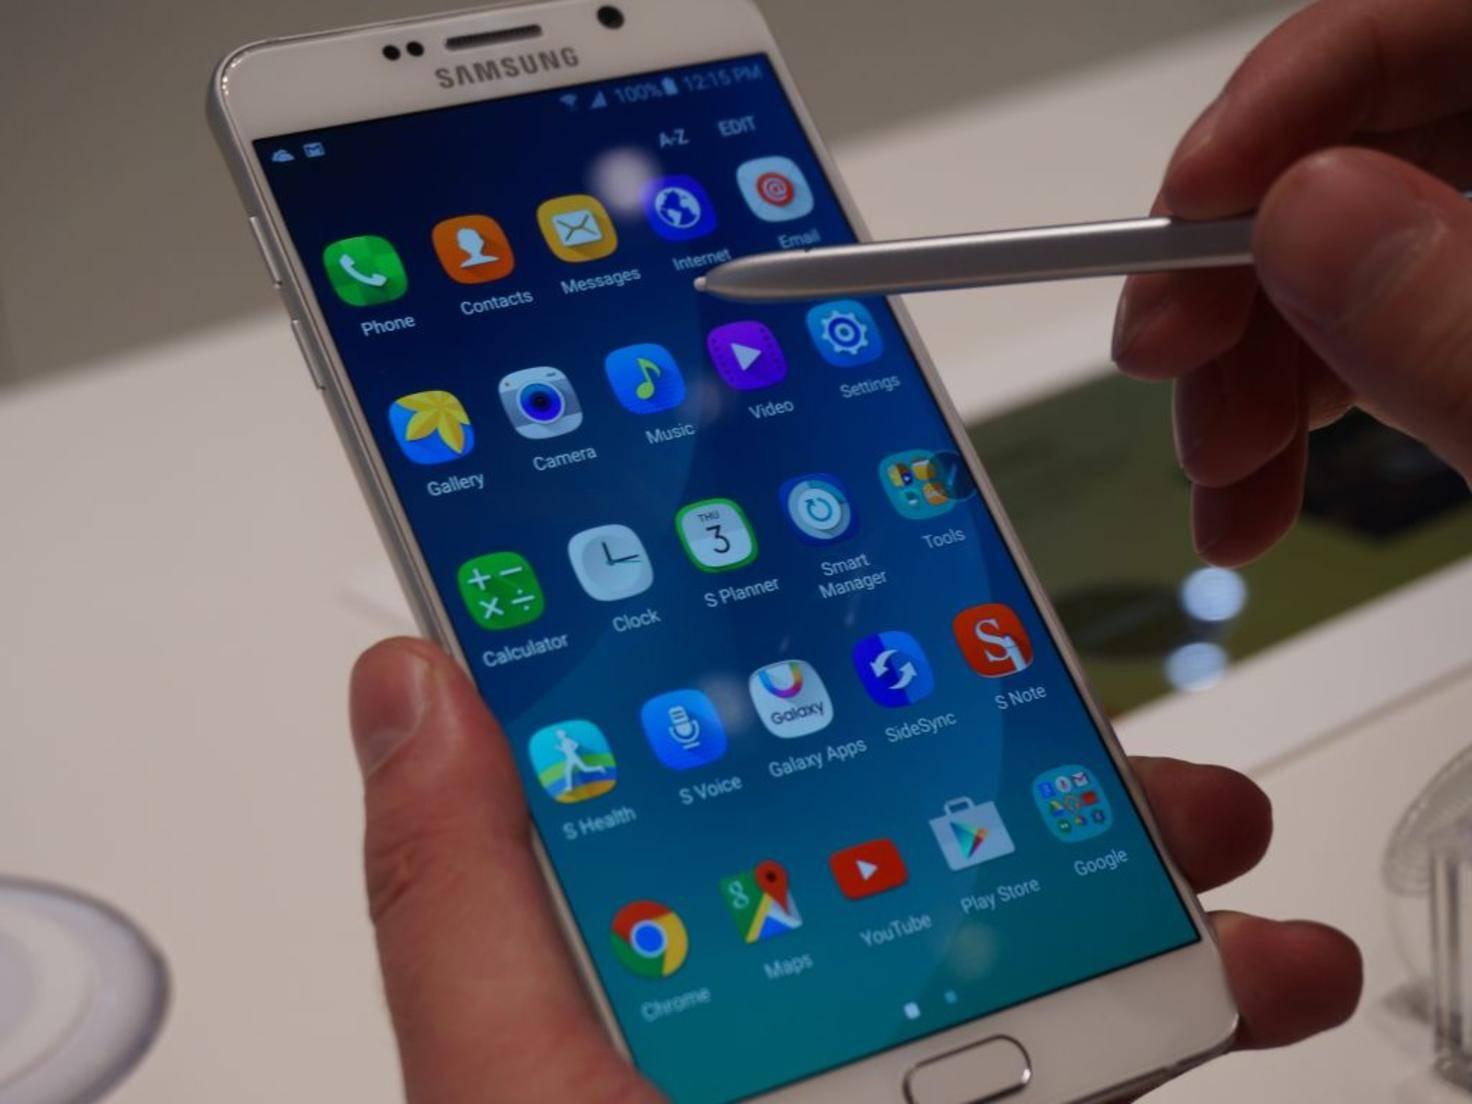 Samsung Galaxy Note 5 3